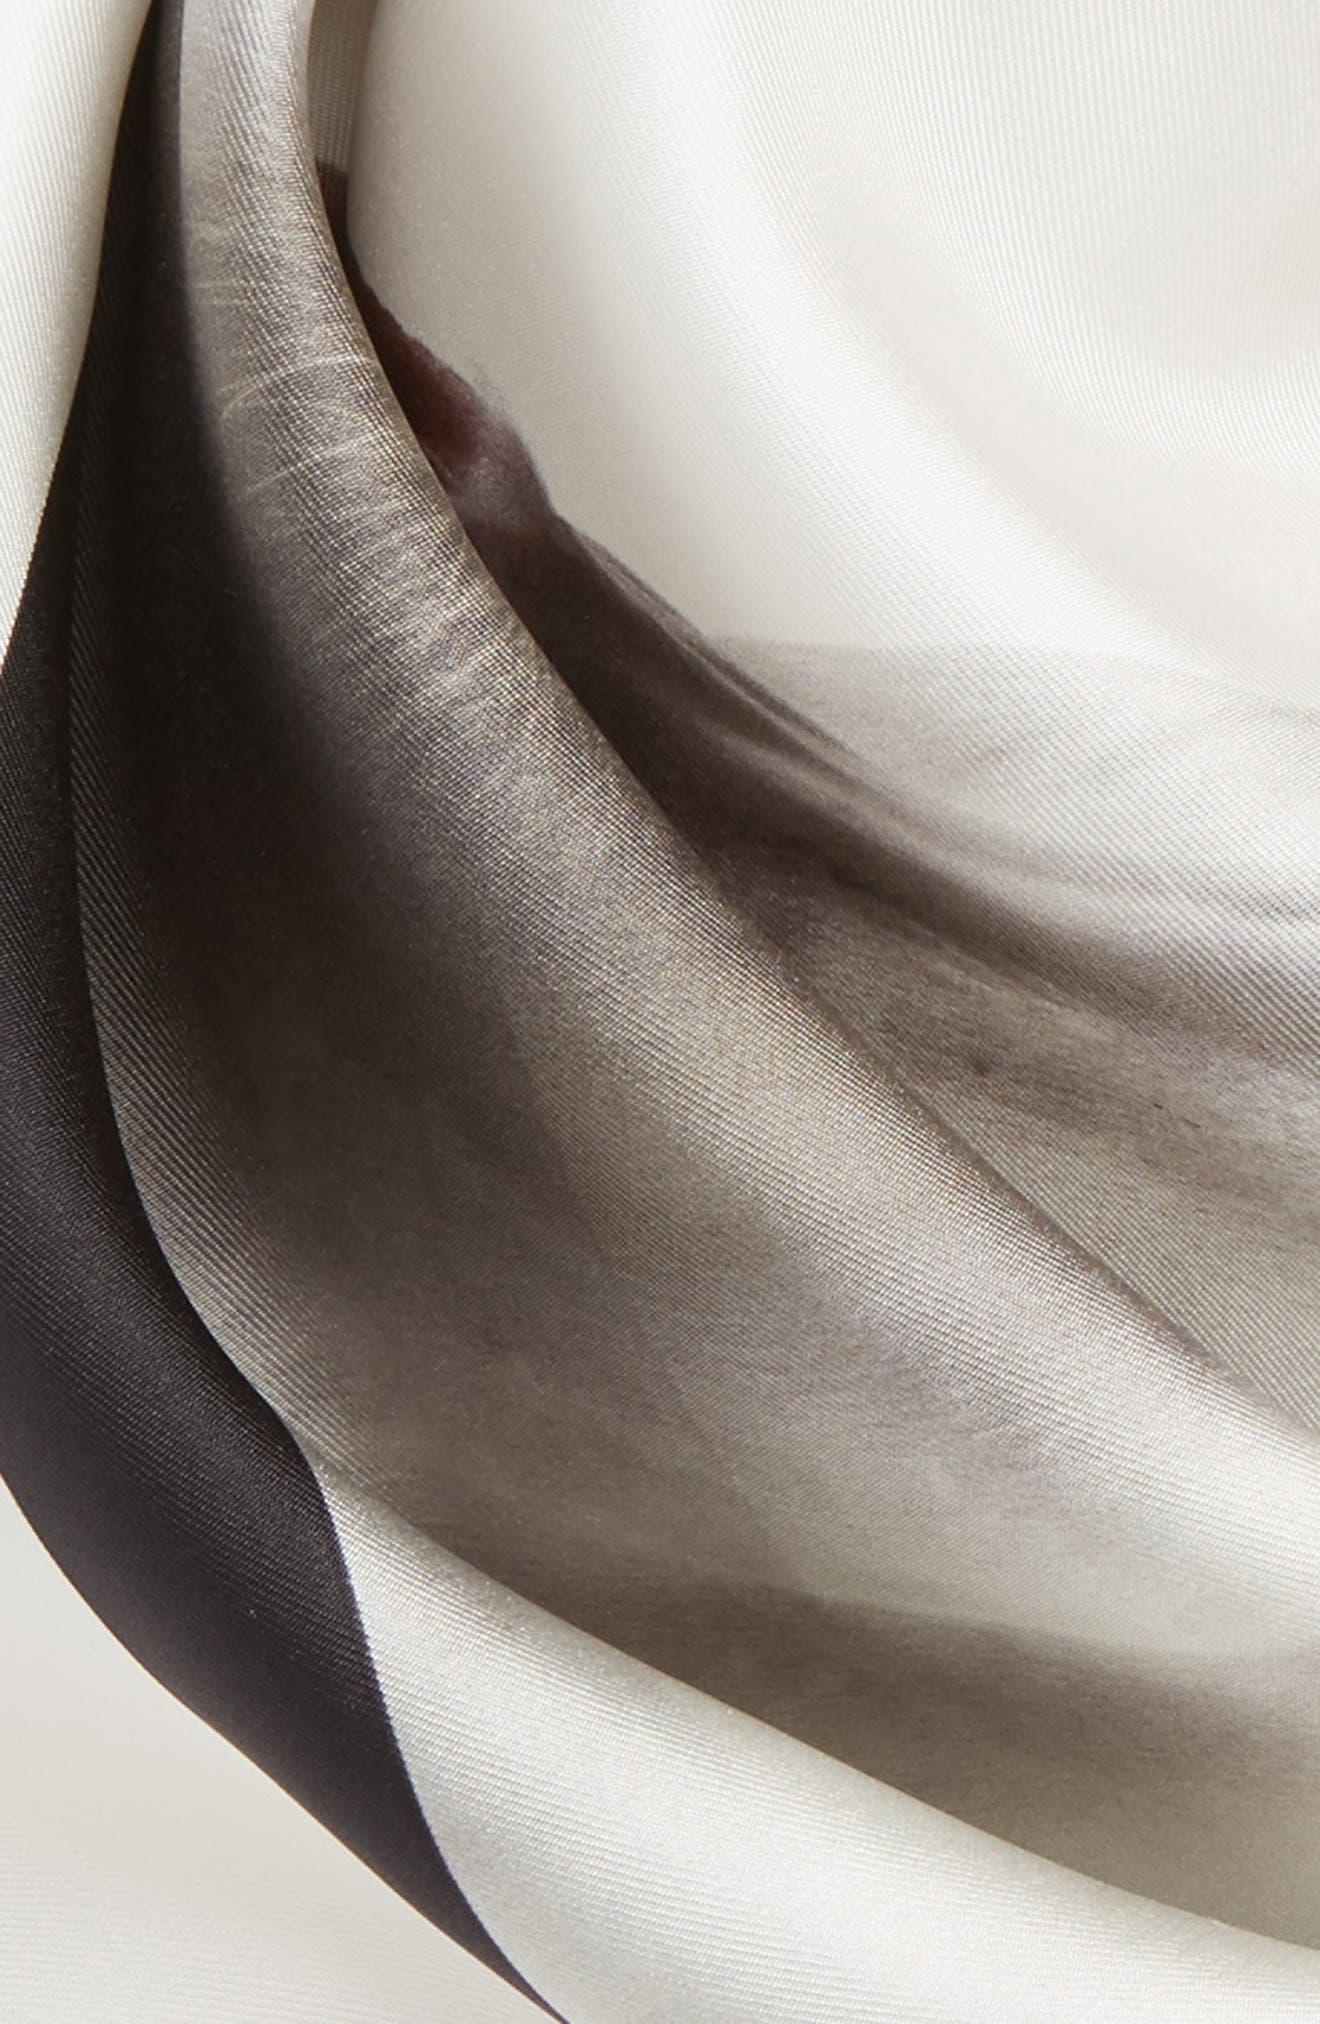 BURBERRY, Unicorn Graphic Square Silk Scarf, Alternate thumbnail 4, color, WHITE